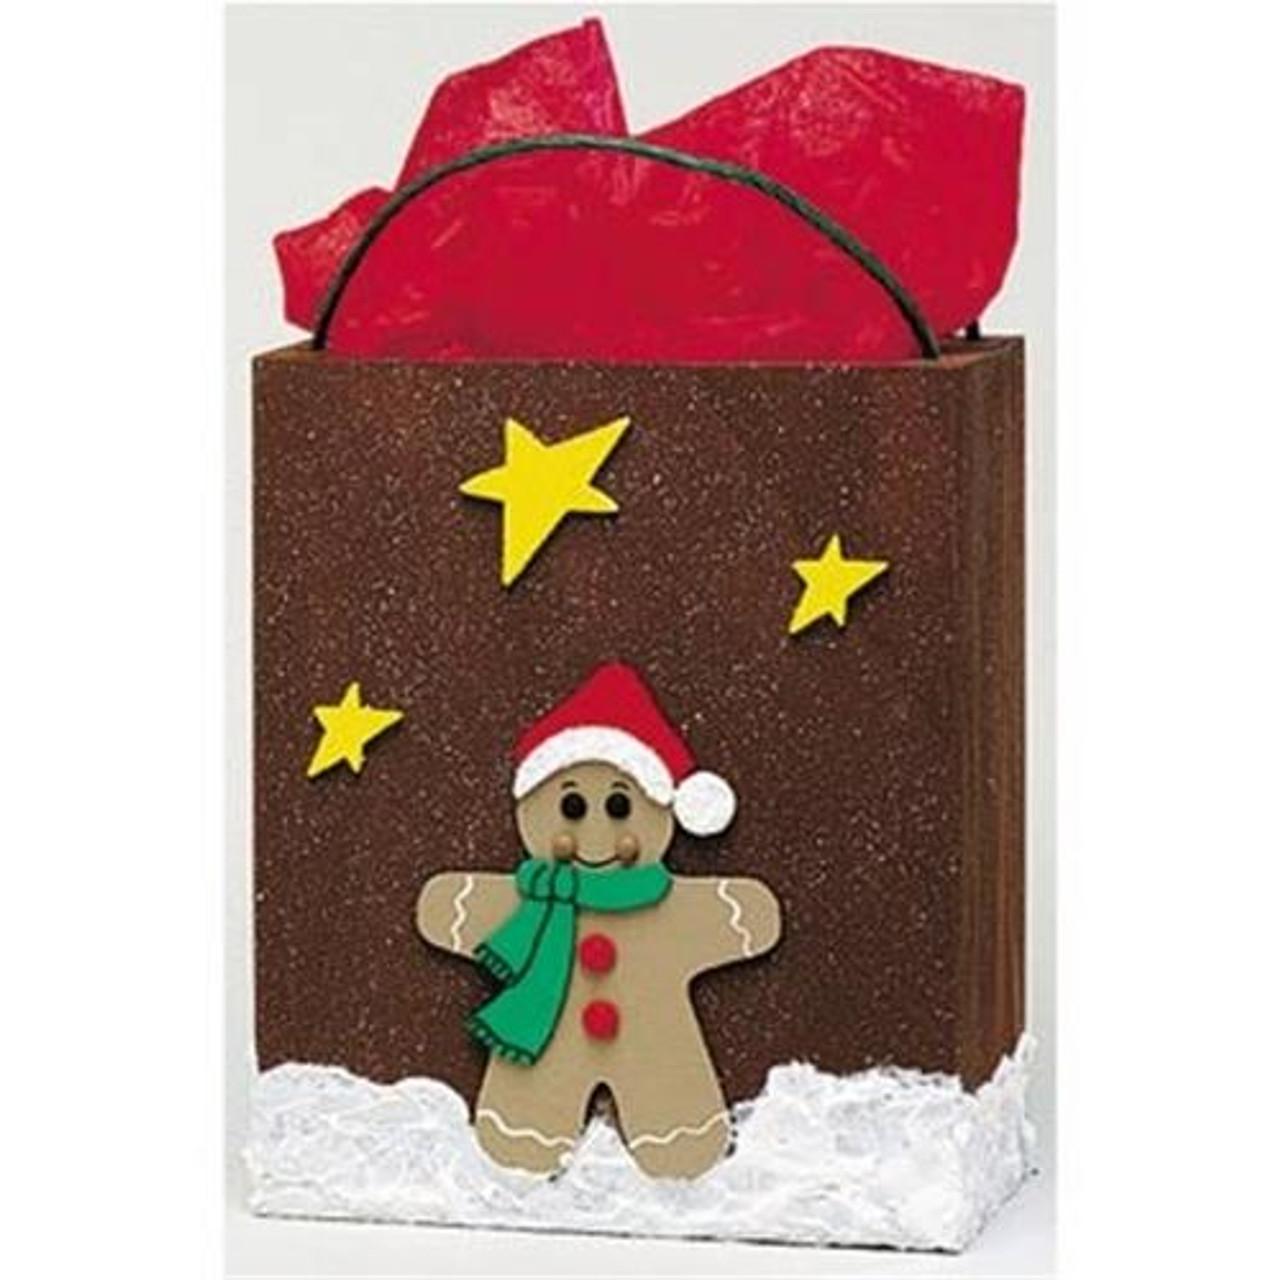 Cherry Tree Toys Large Gingerbread Man Gift Bag Plan